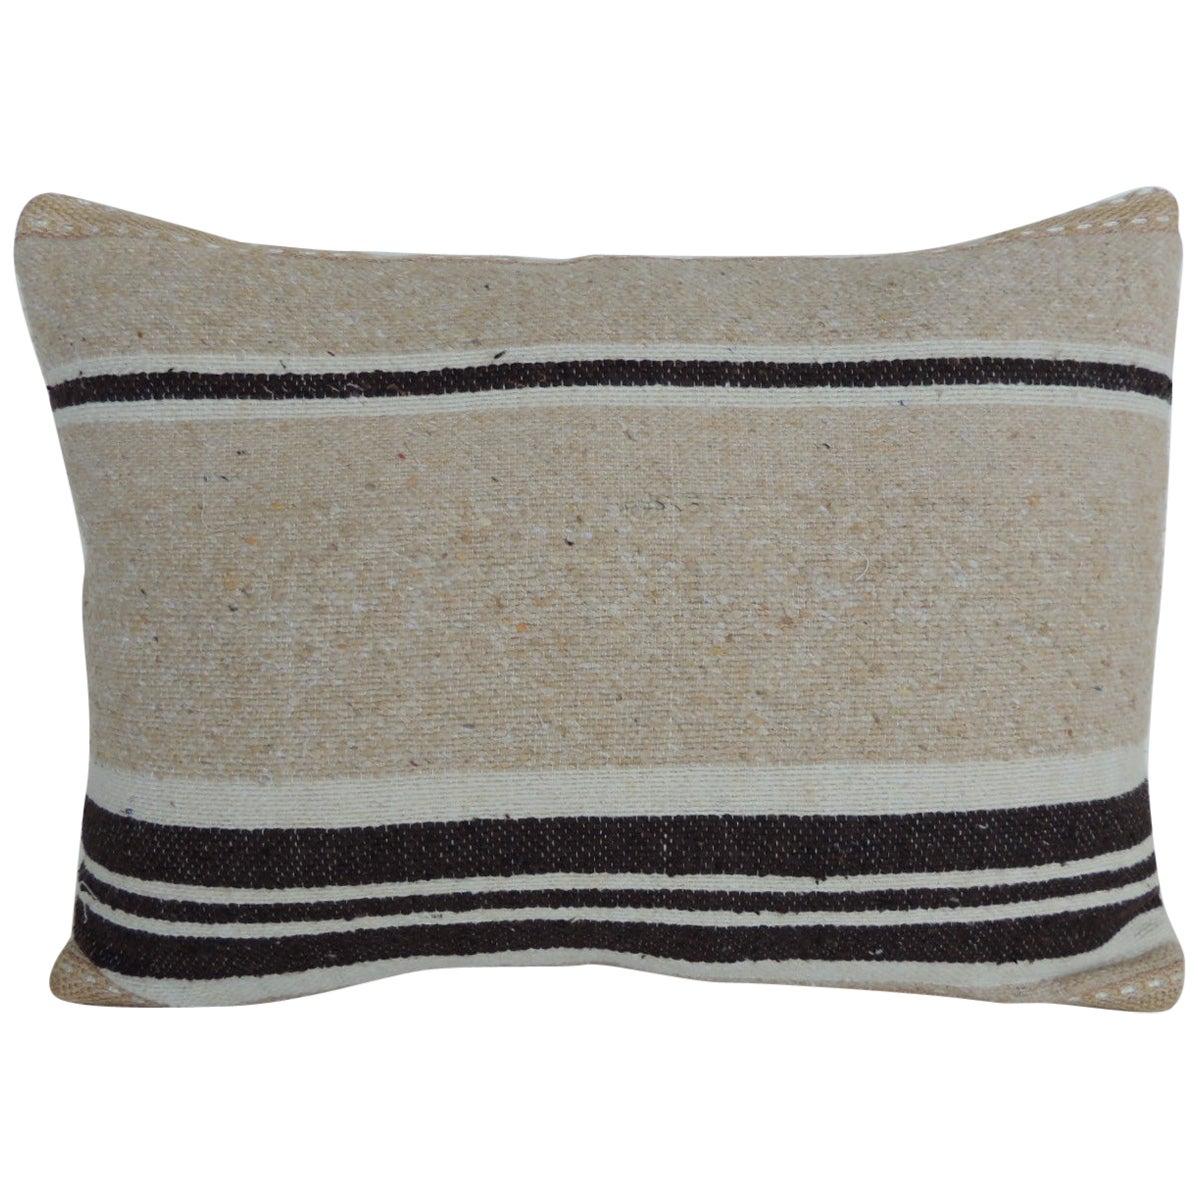 Vintage Woven Tribal Artisanal Textile Decorative Bolster Pillow